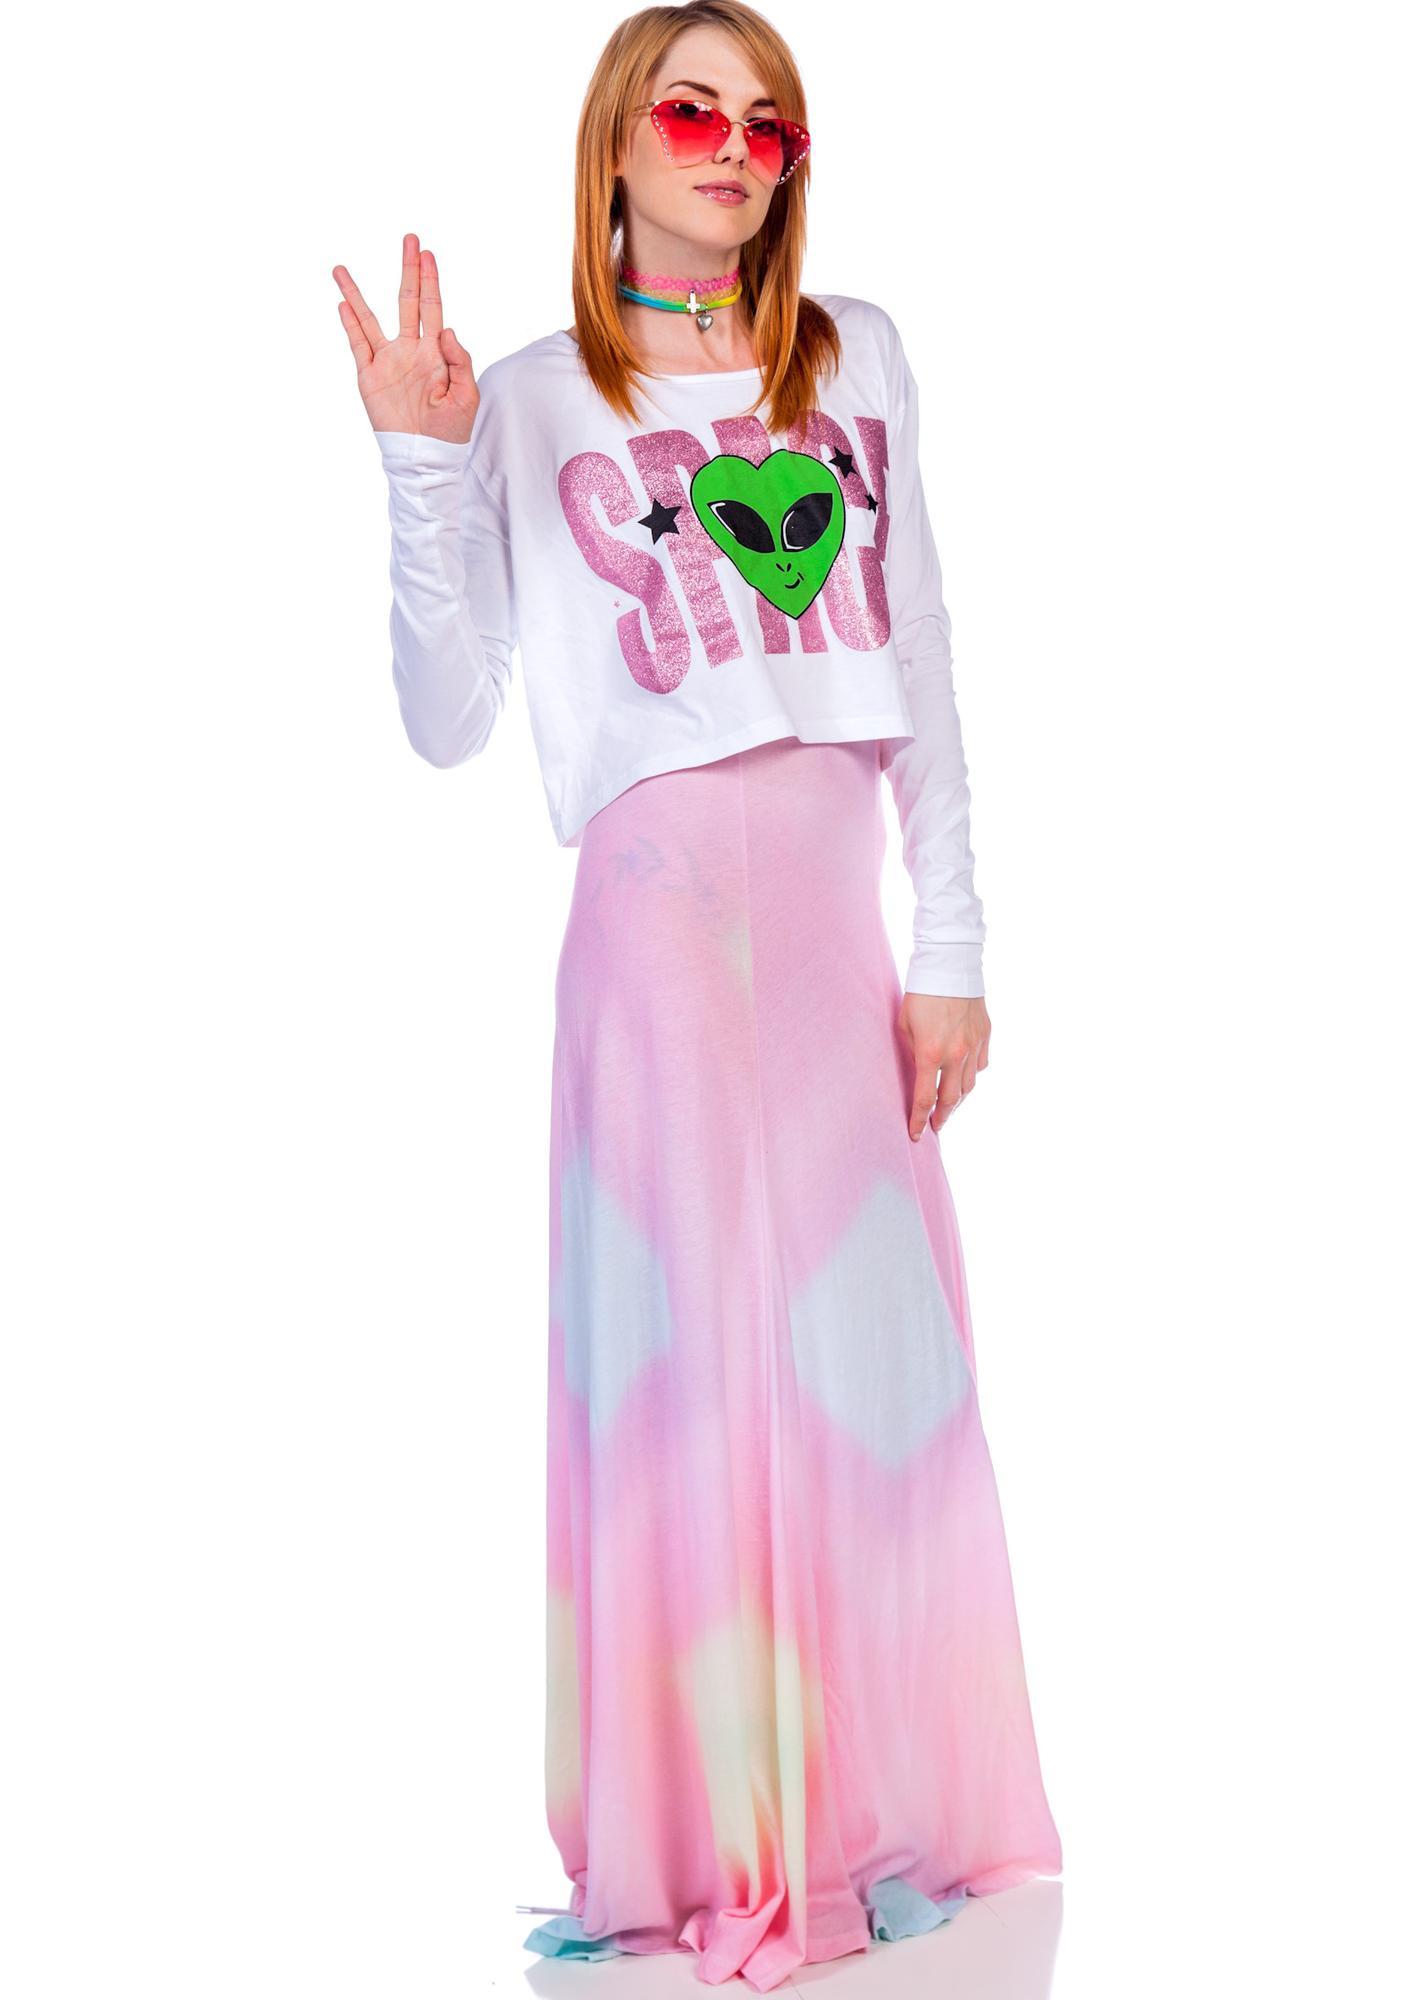 Wildfox Couture Rainbow Brite Verona Skirt